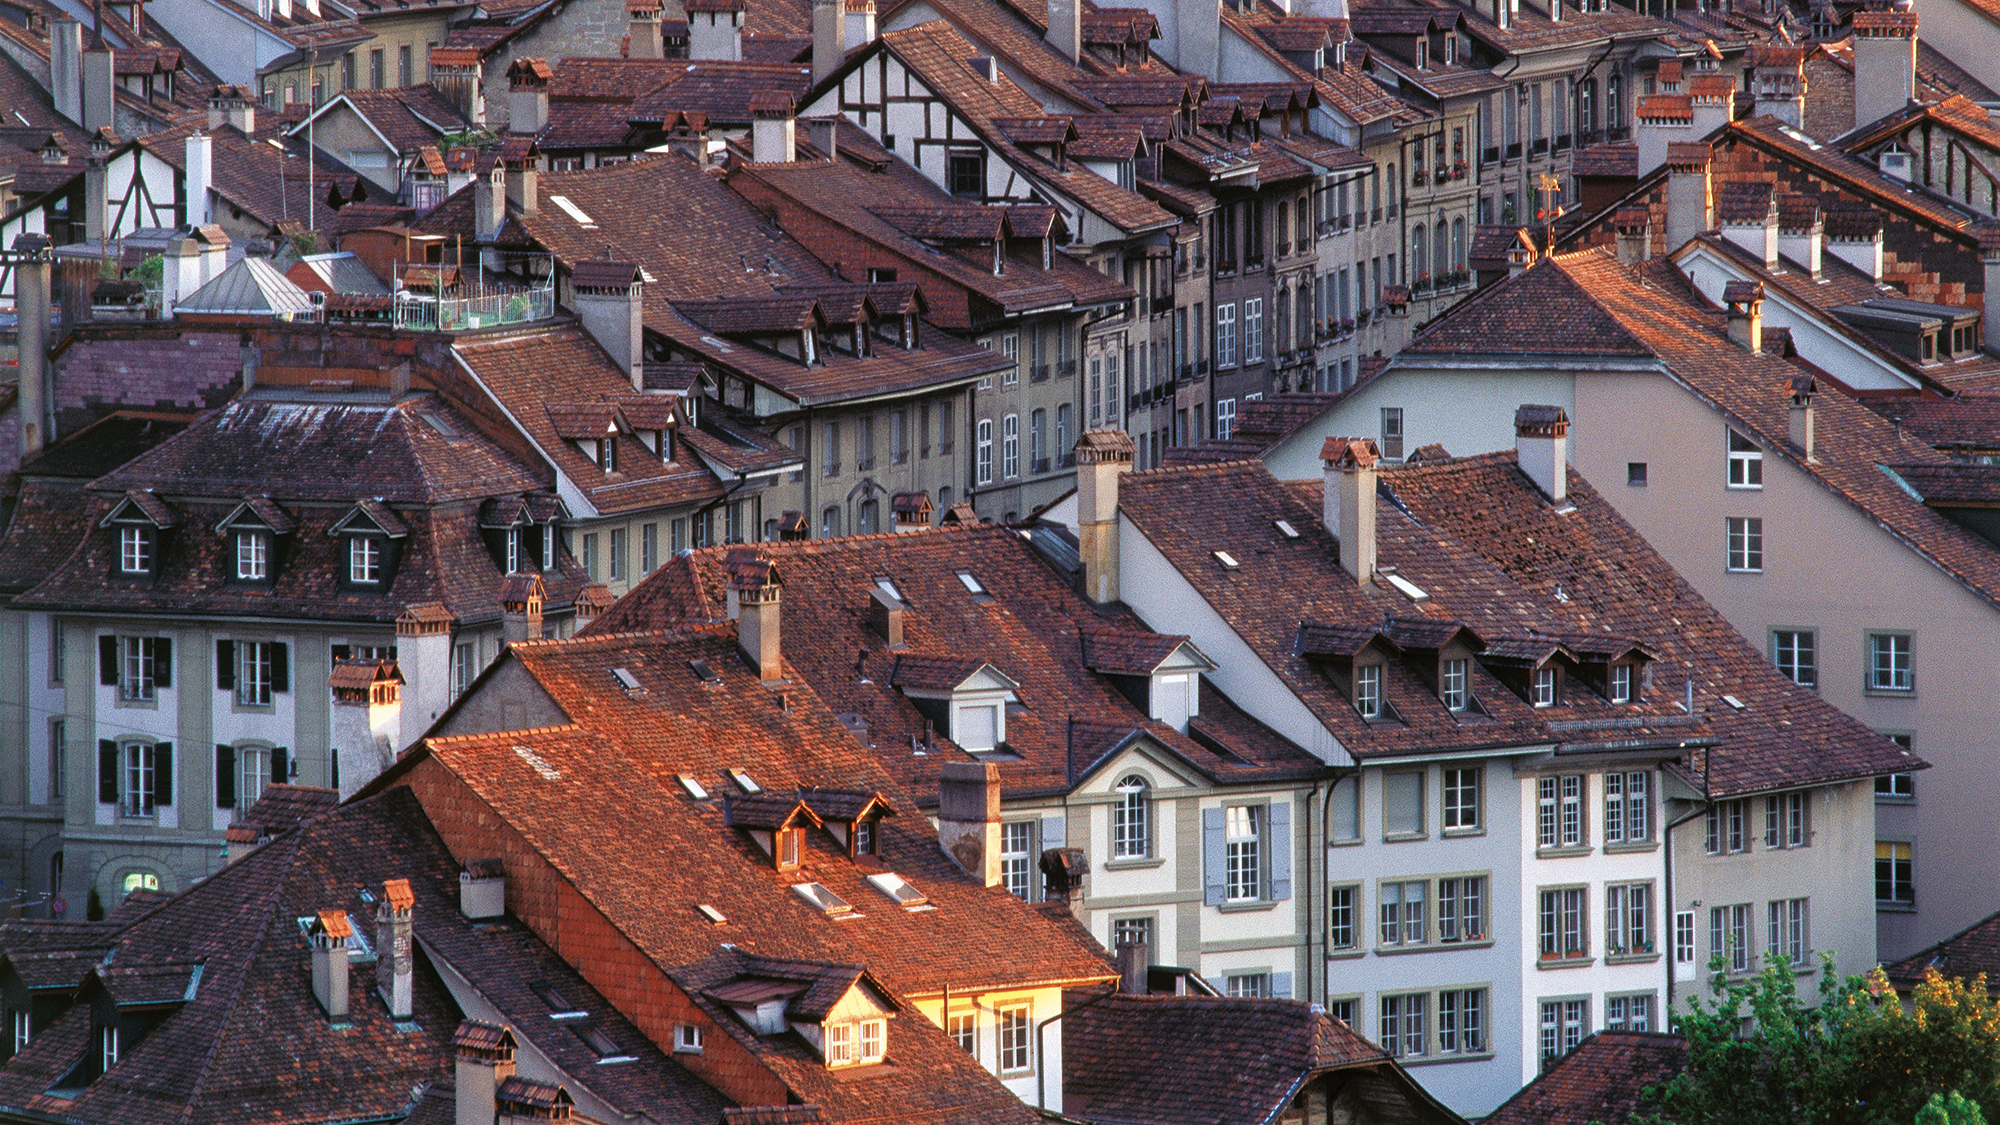 In Bern, Switzerland, time well spent